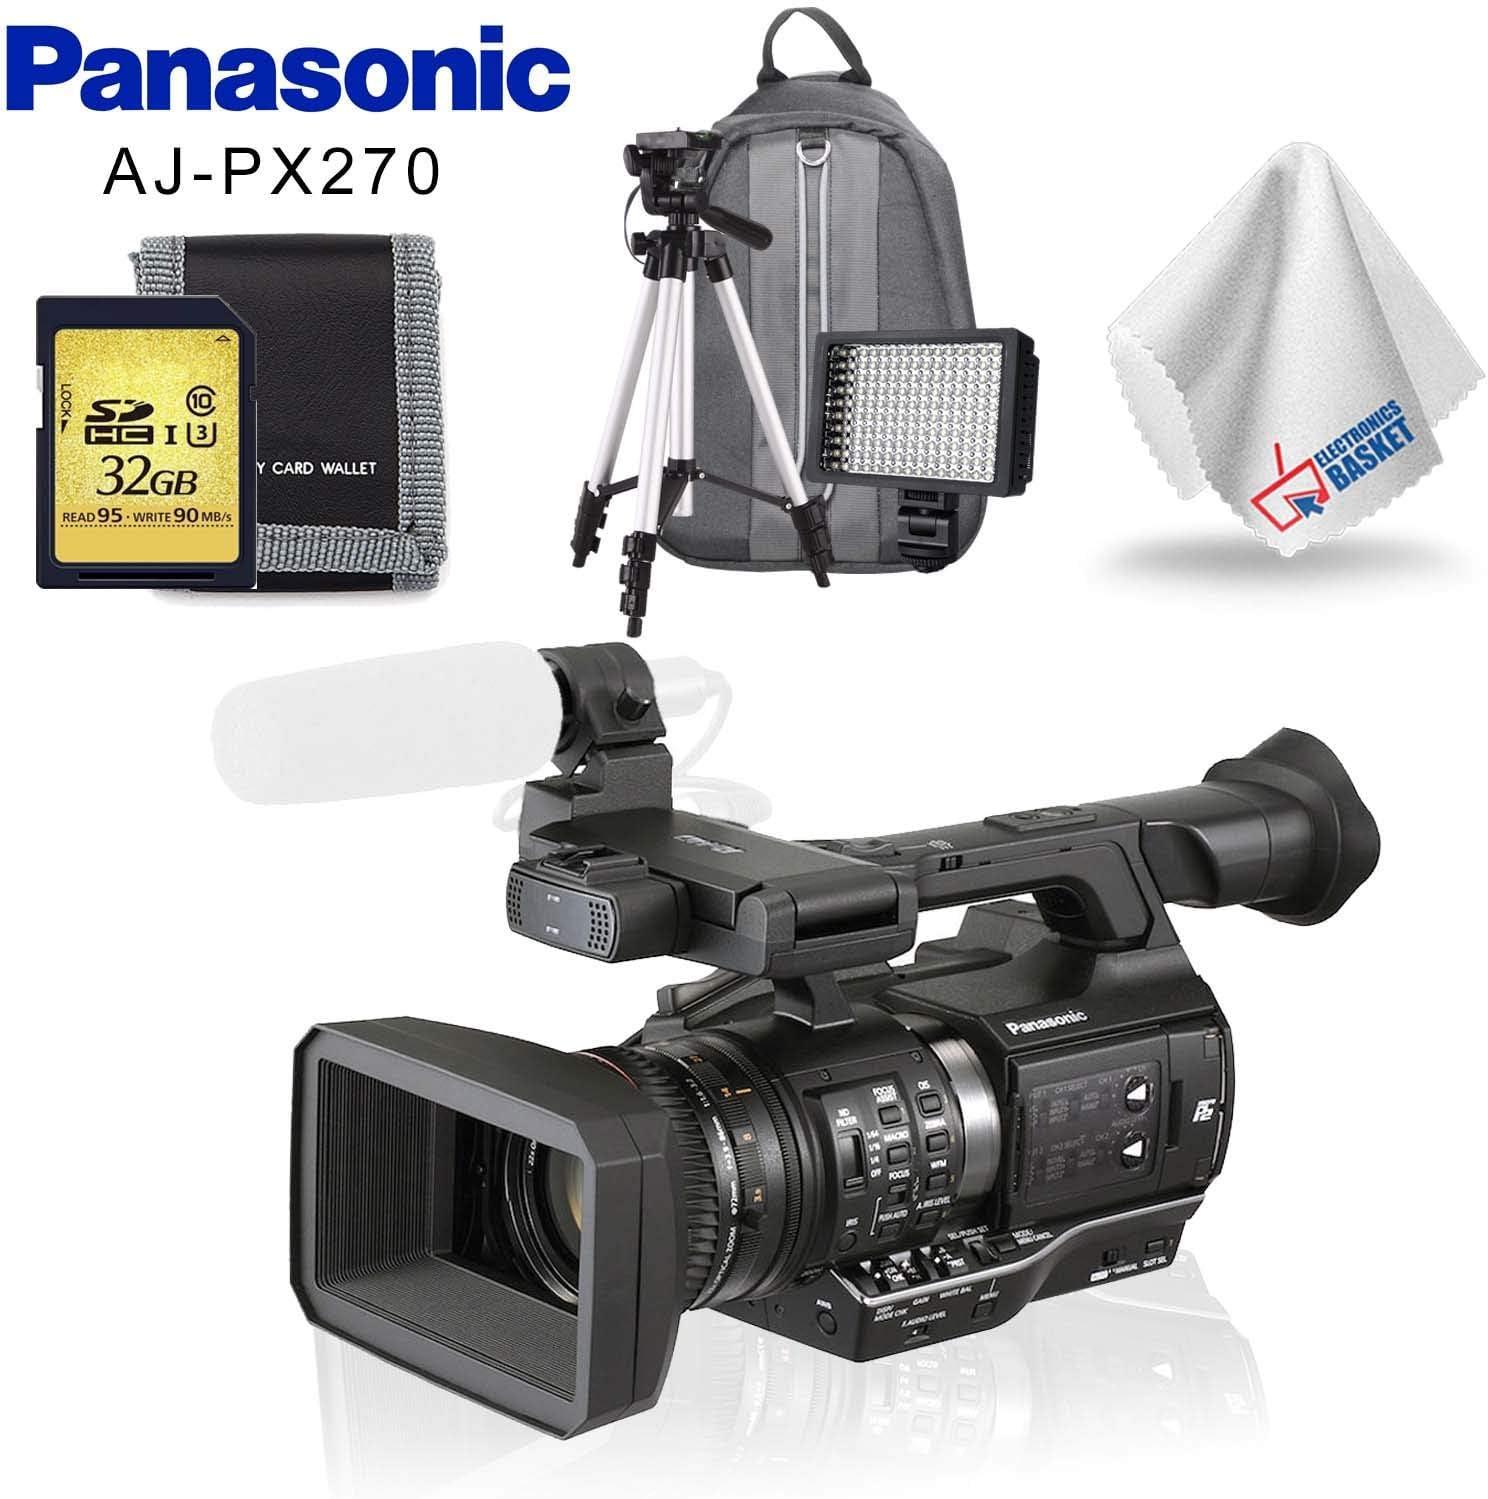 price Panasonic AJ-PX270 microP2 Handheld Phoenix Mall AVC-Ultra + HD Camcorder Mem